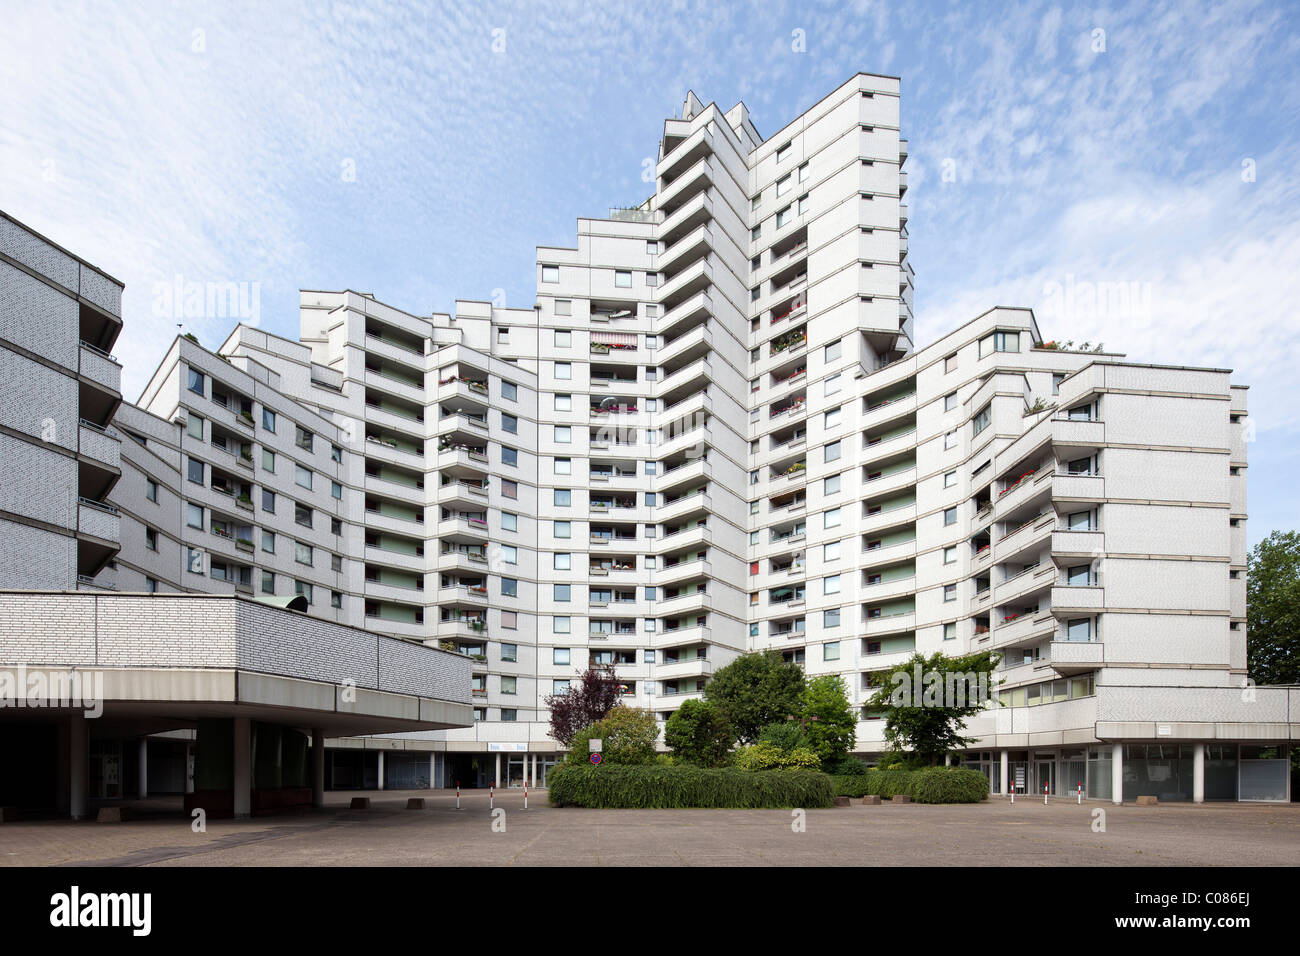 Residential tower, Gelsenkirchen, Ruhr Area, North Rhine-Westphalia, Germany, Europe - Stock Image